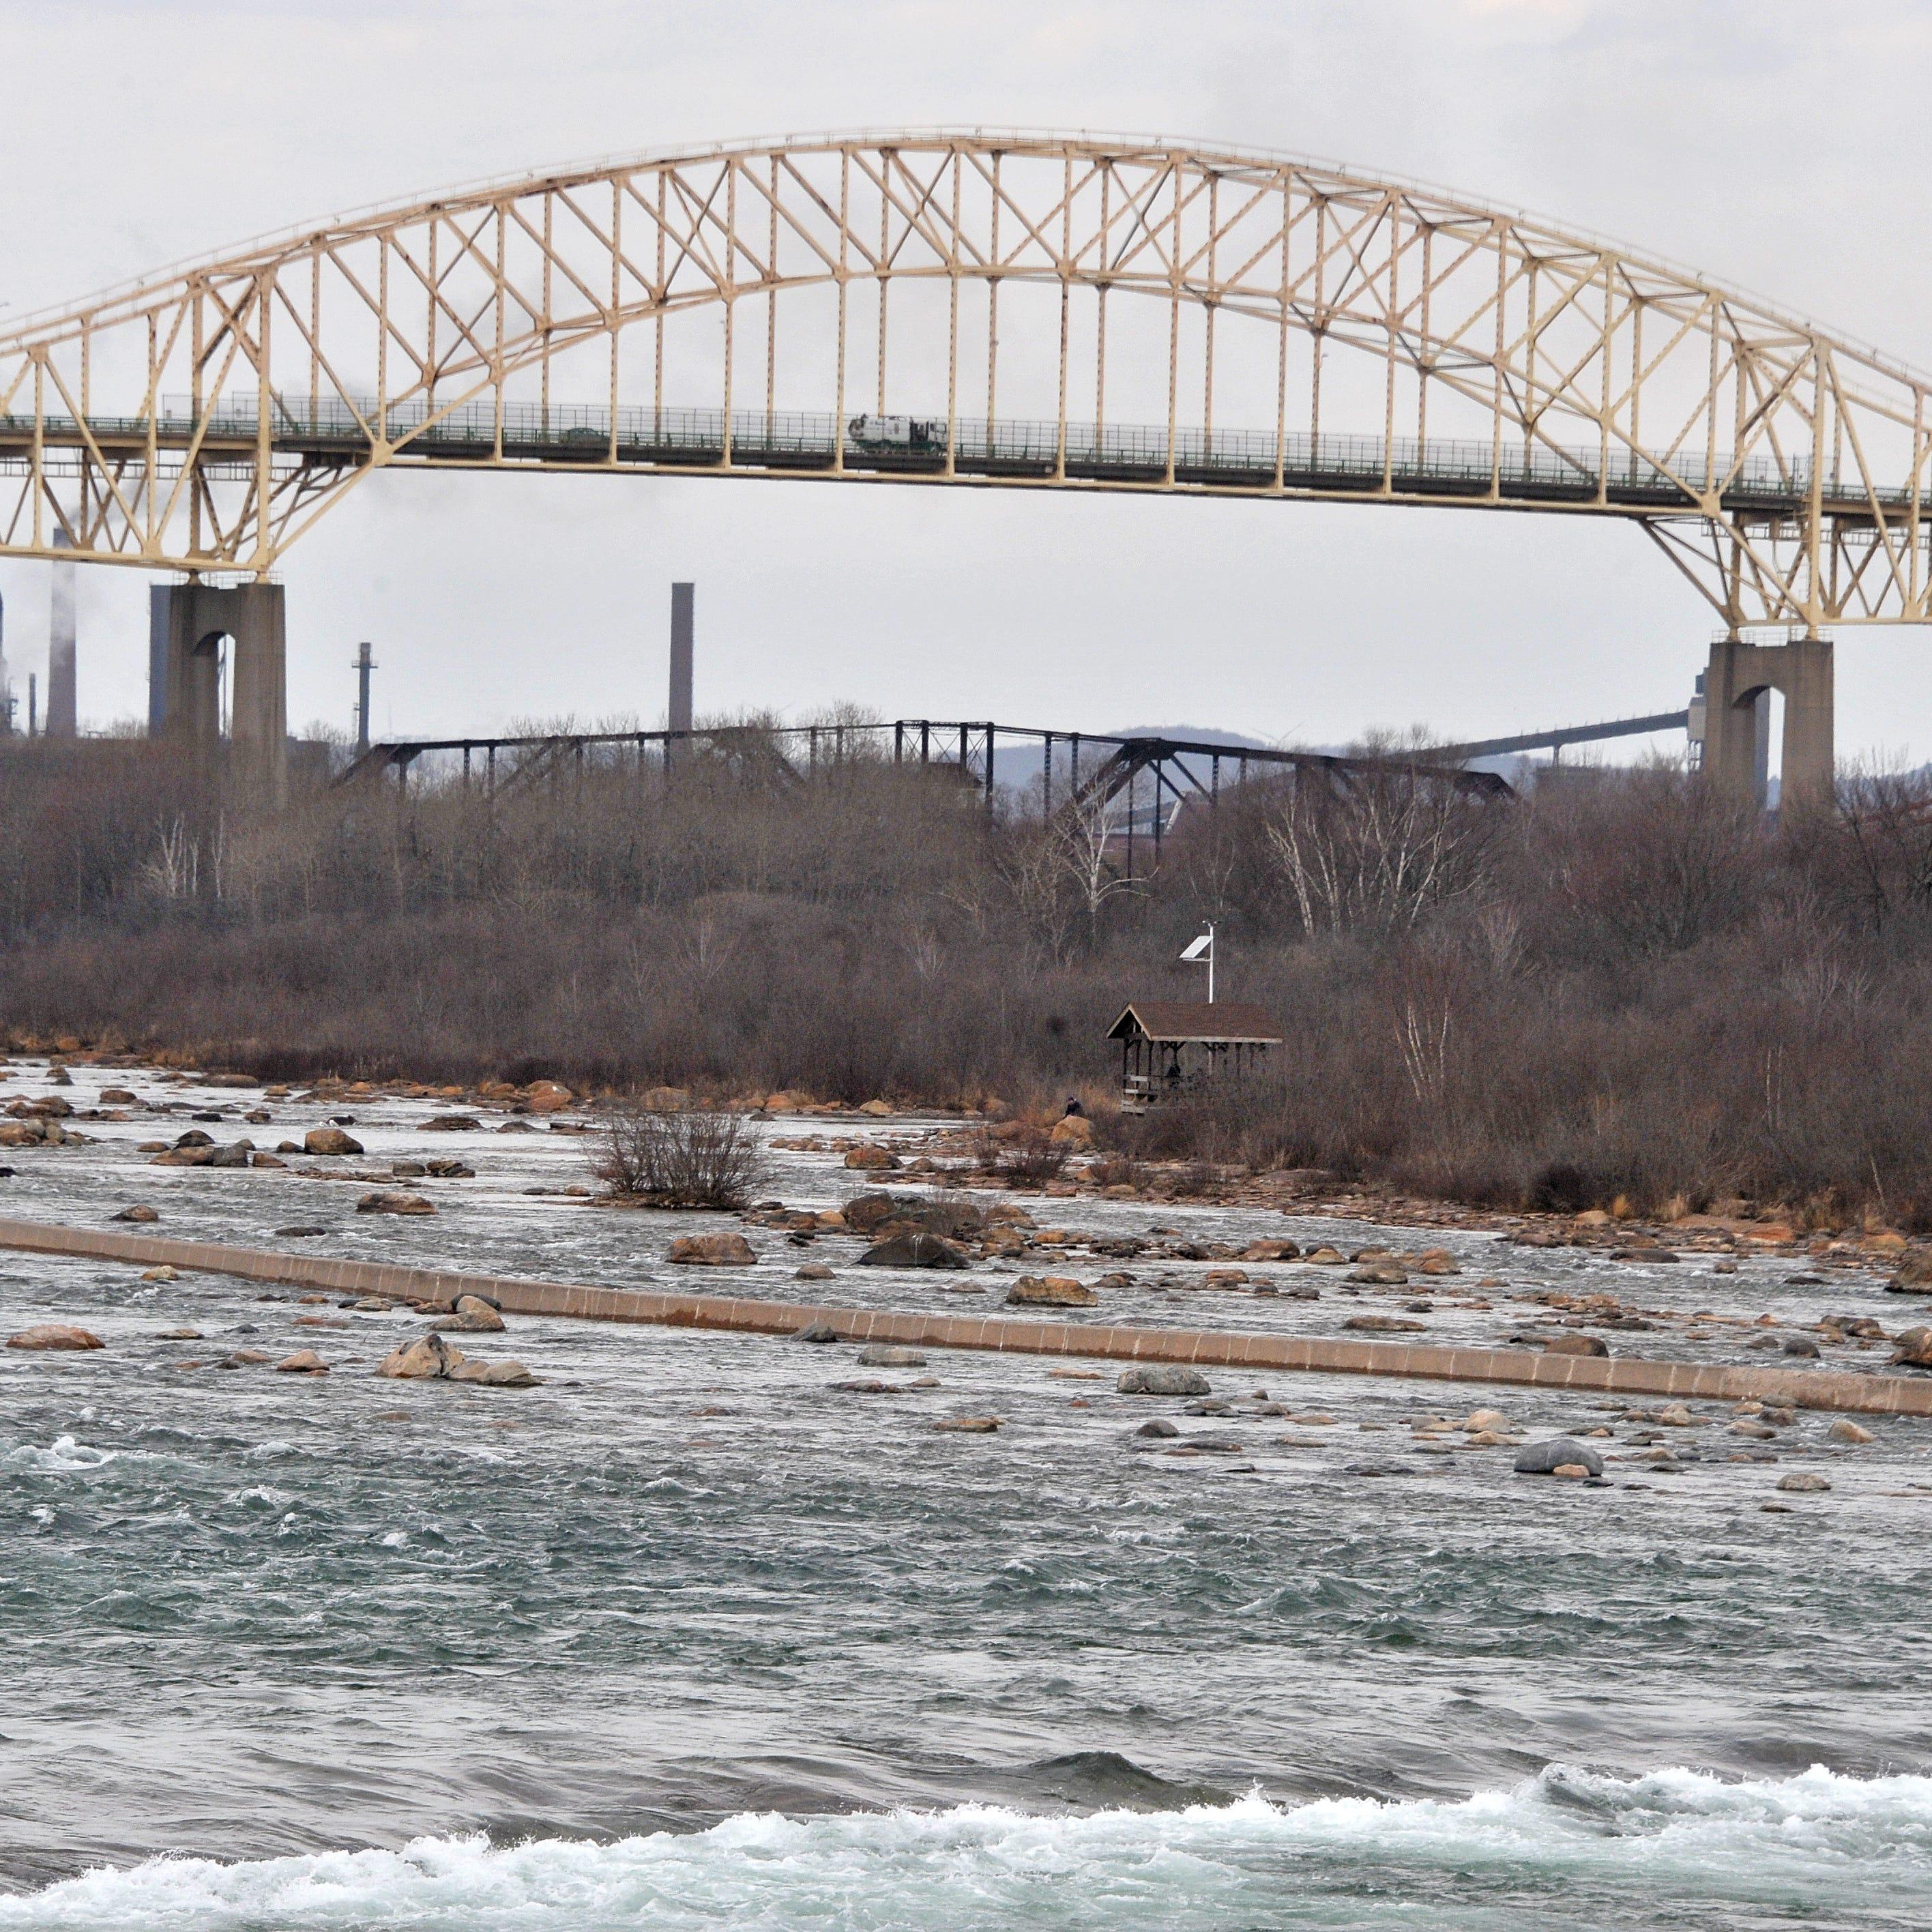 Toll hike coming to International Bridge on April 1